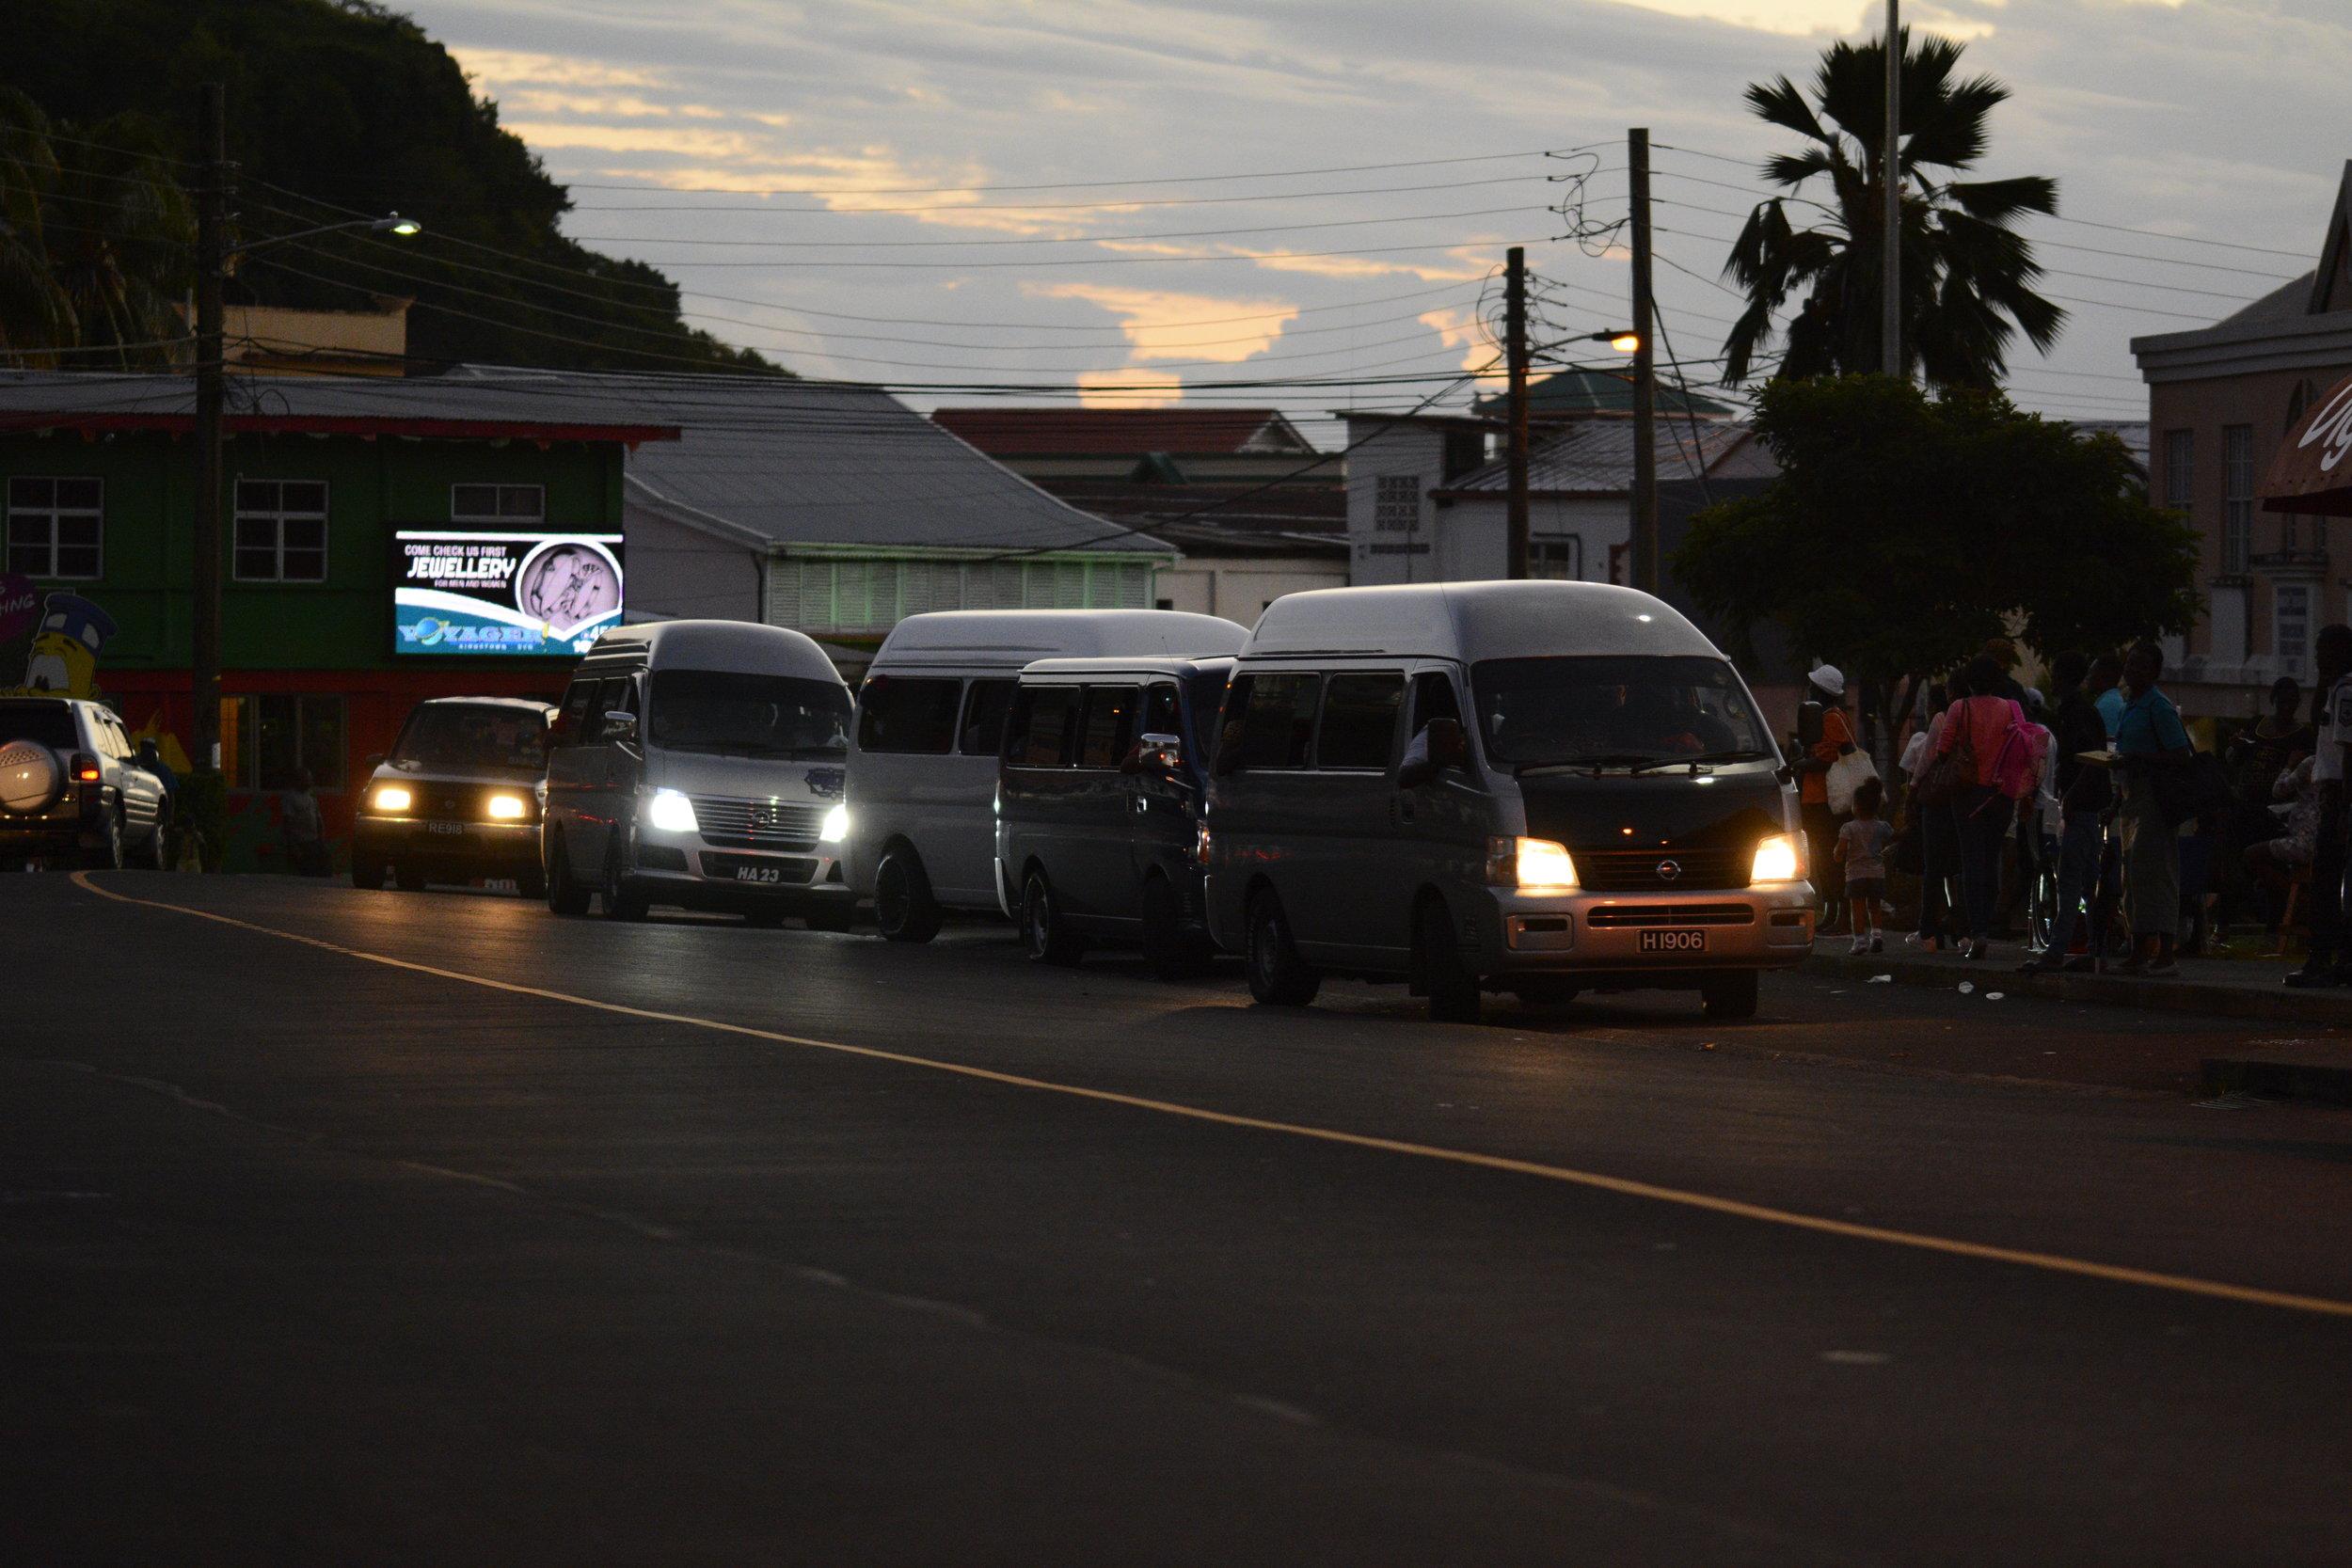 Sundown in St.Vincent at the Peace Memorial Hall Van Terminal